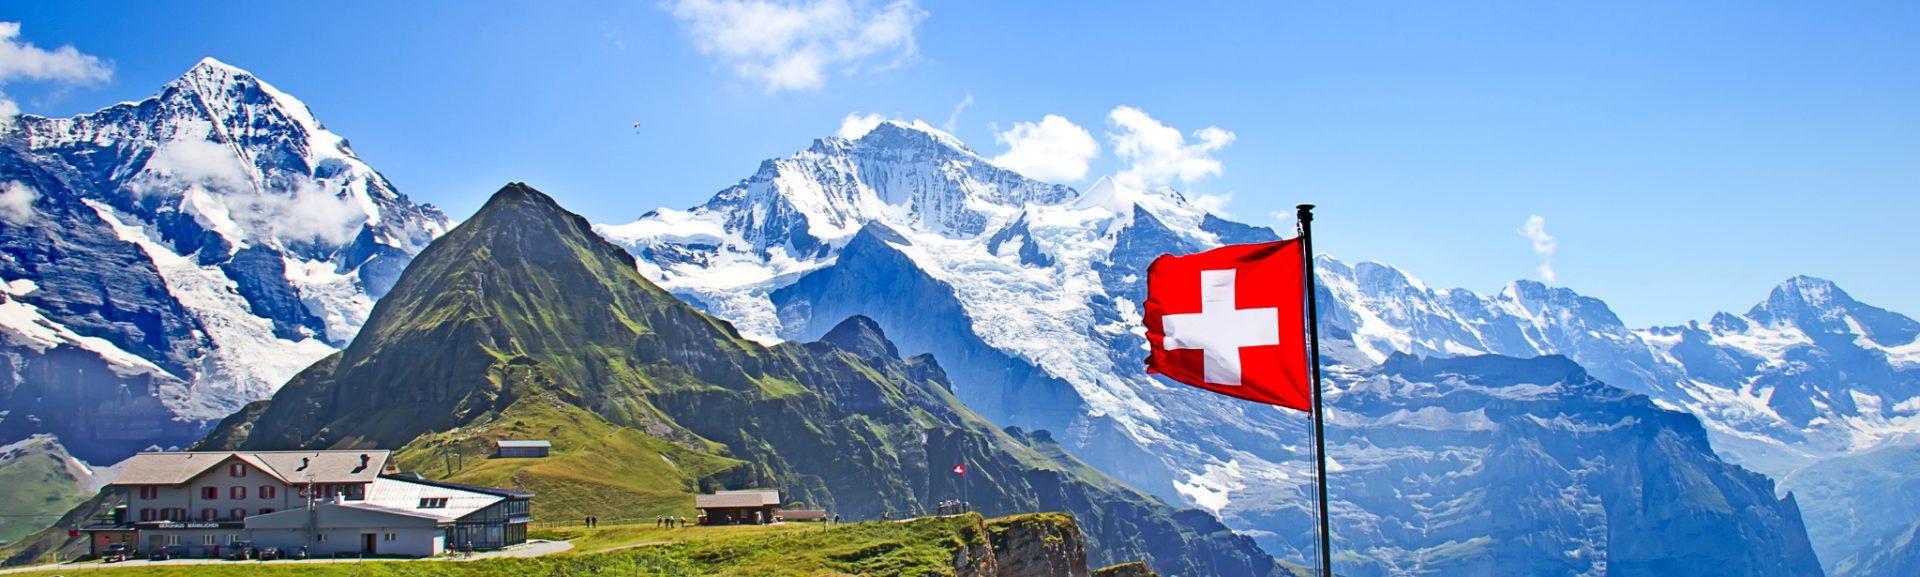 Swiss GriP NonSlip